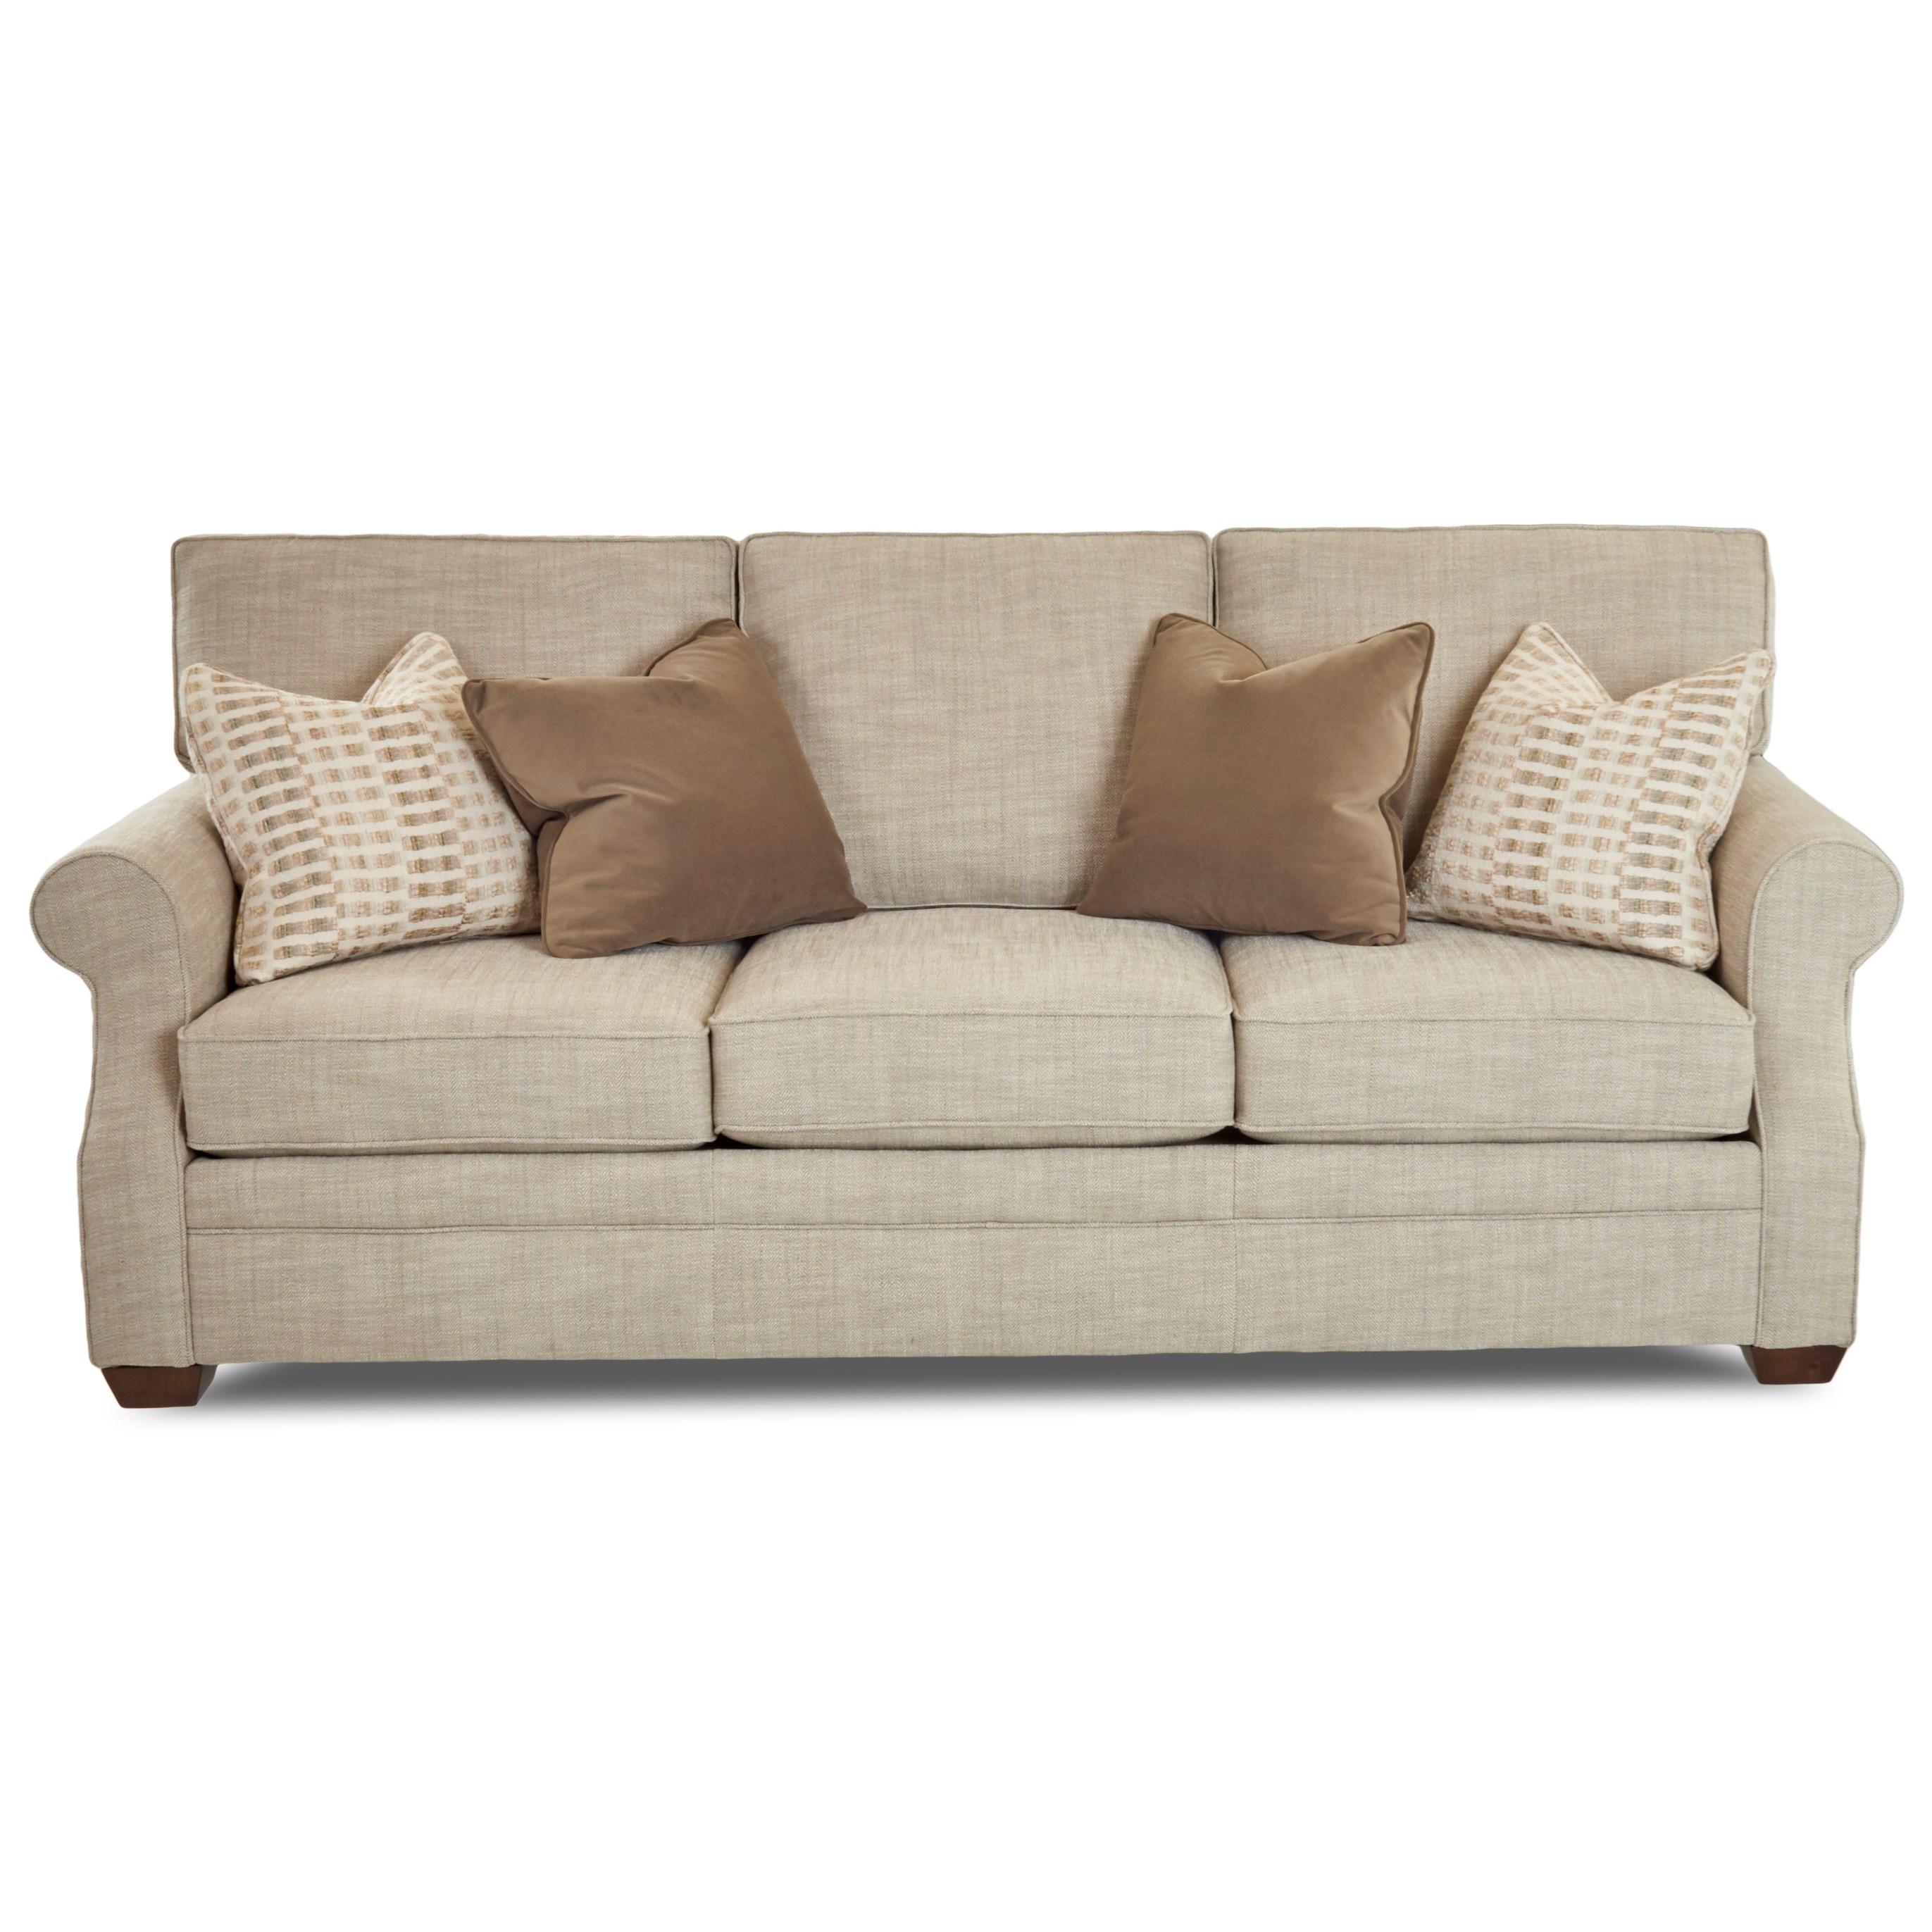 Casual Sleeper Sofa with Enso Memory Foam Mattress